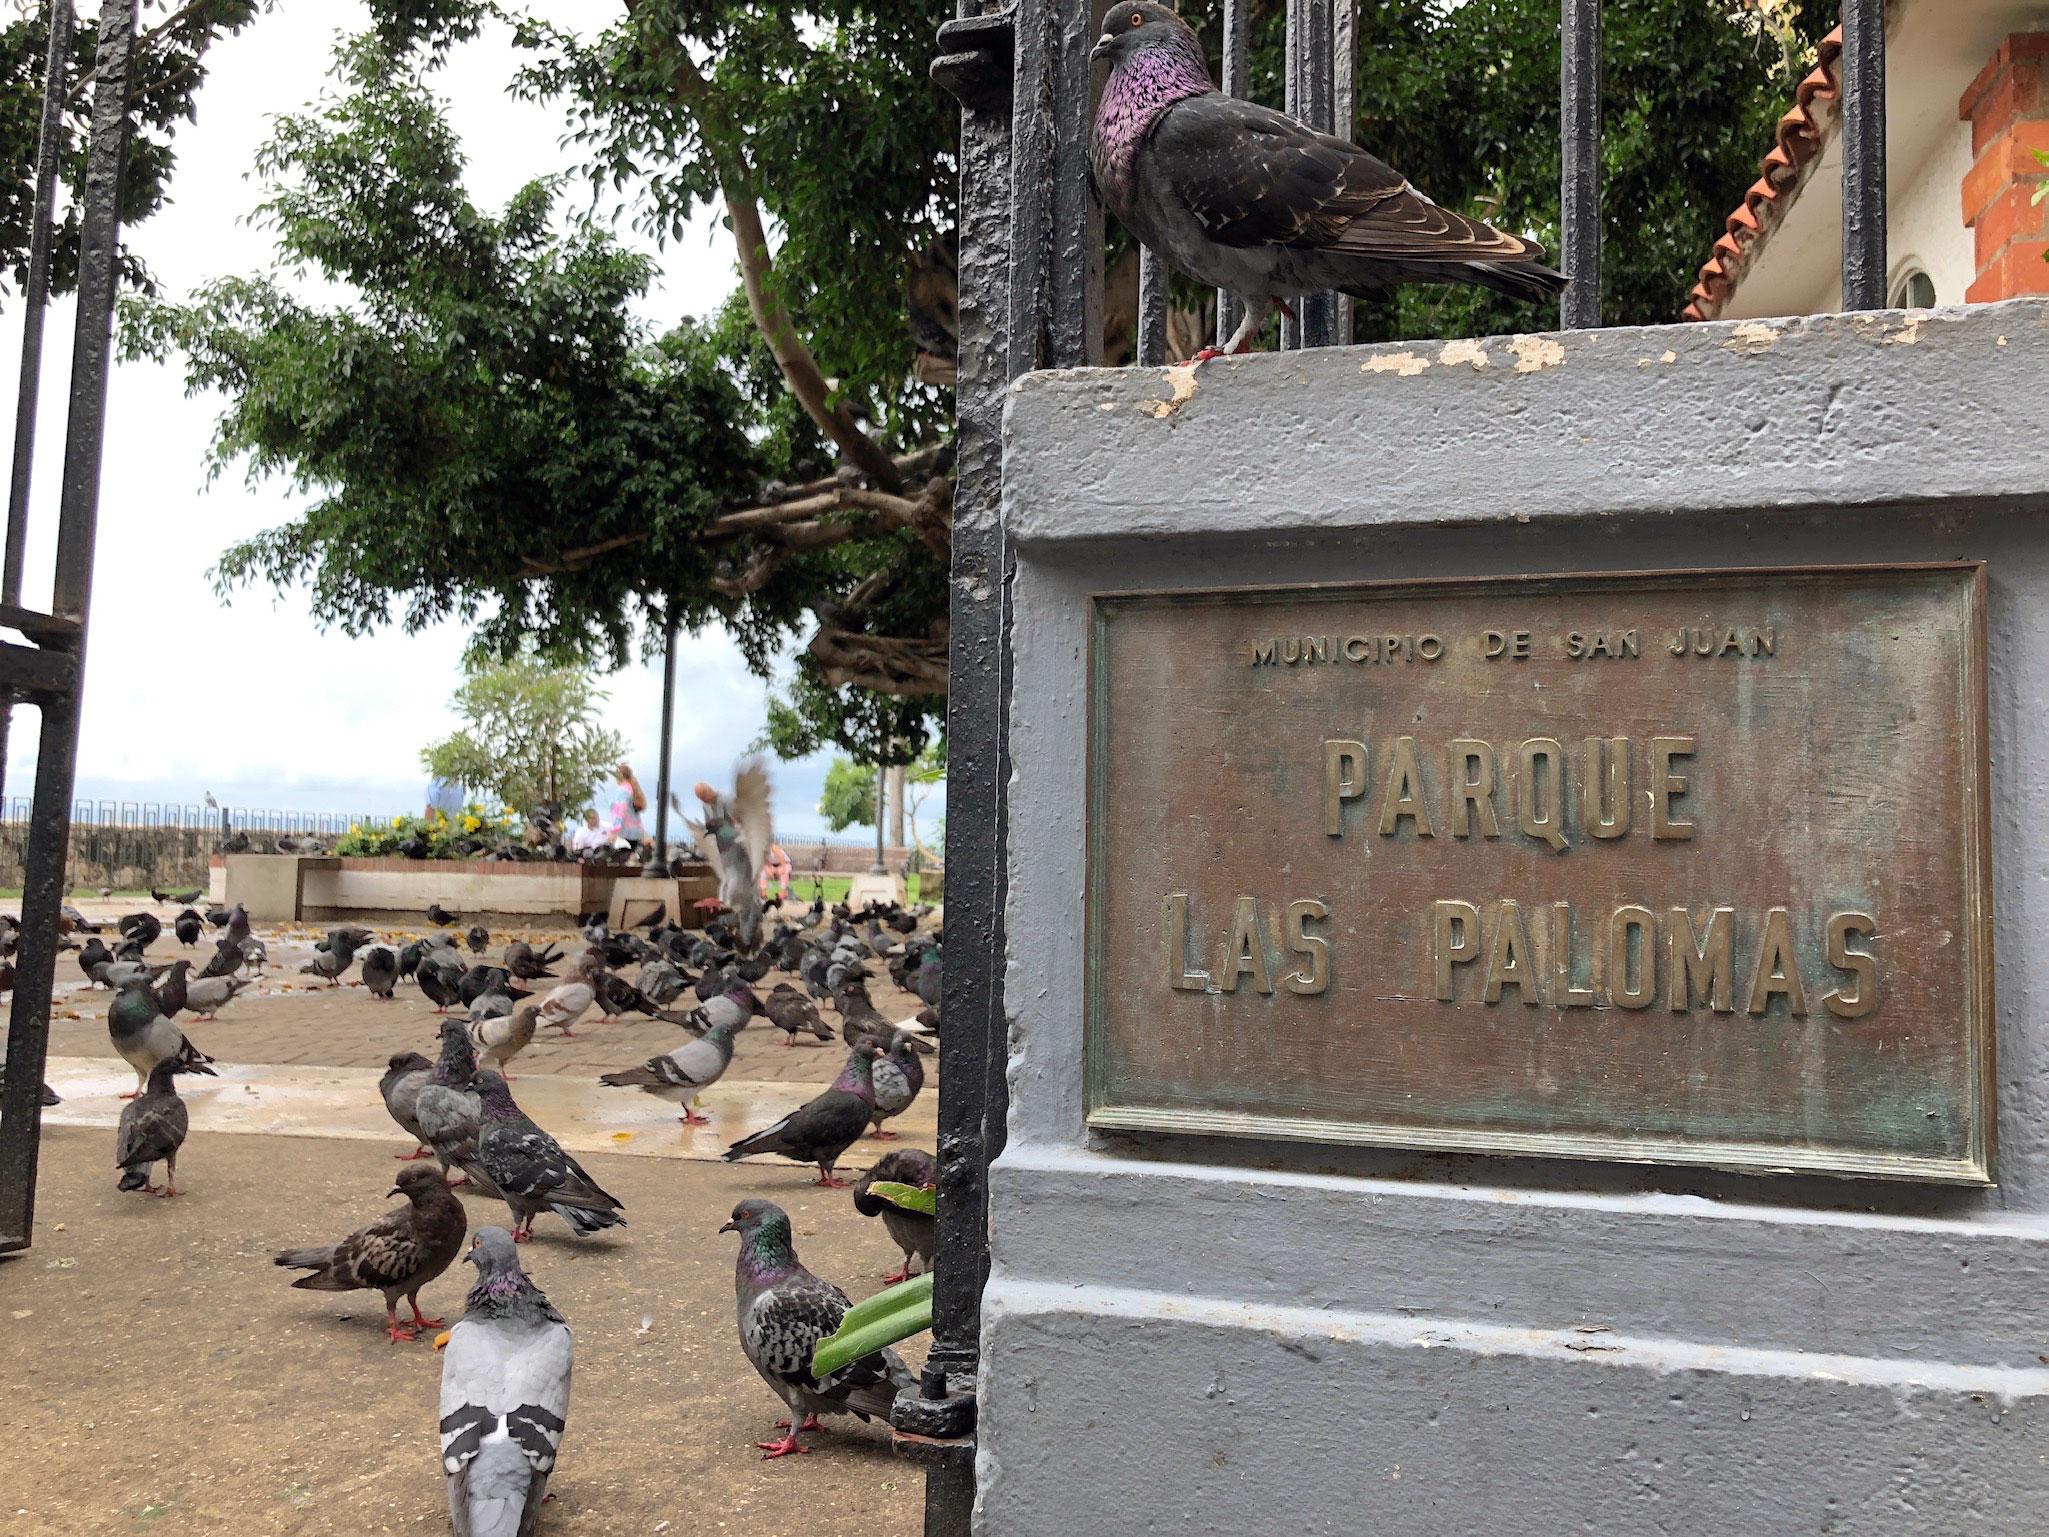 Parque las palomas san juan